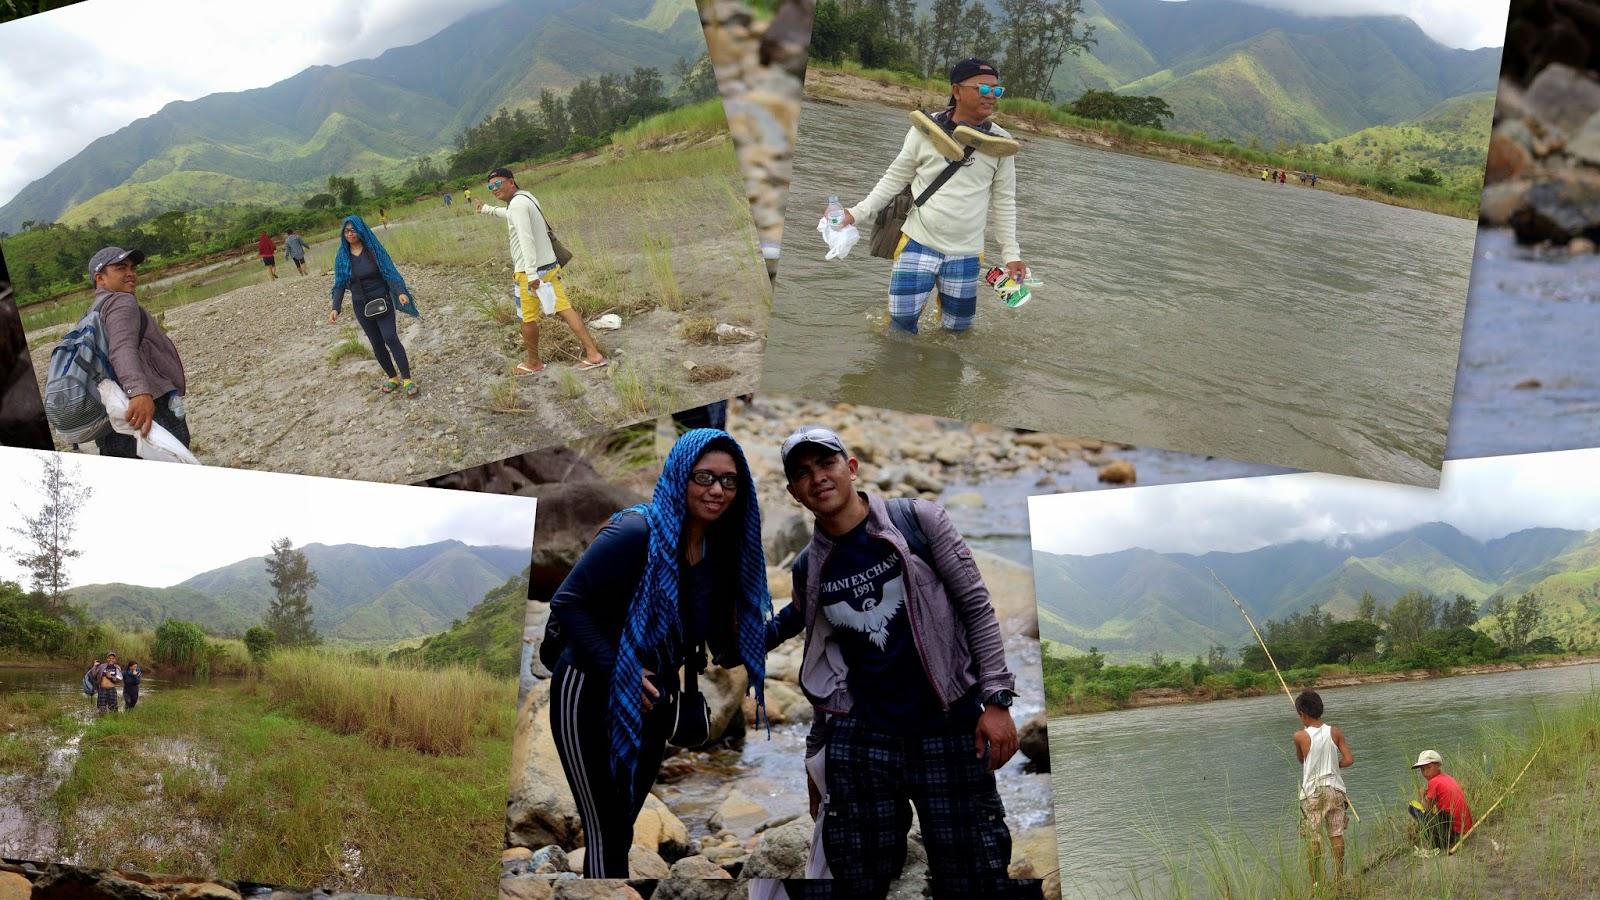 Capalngan Falls Trekking Pictures